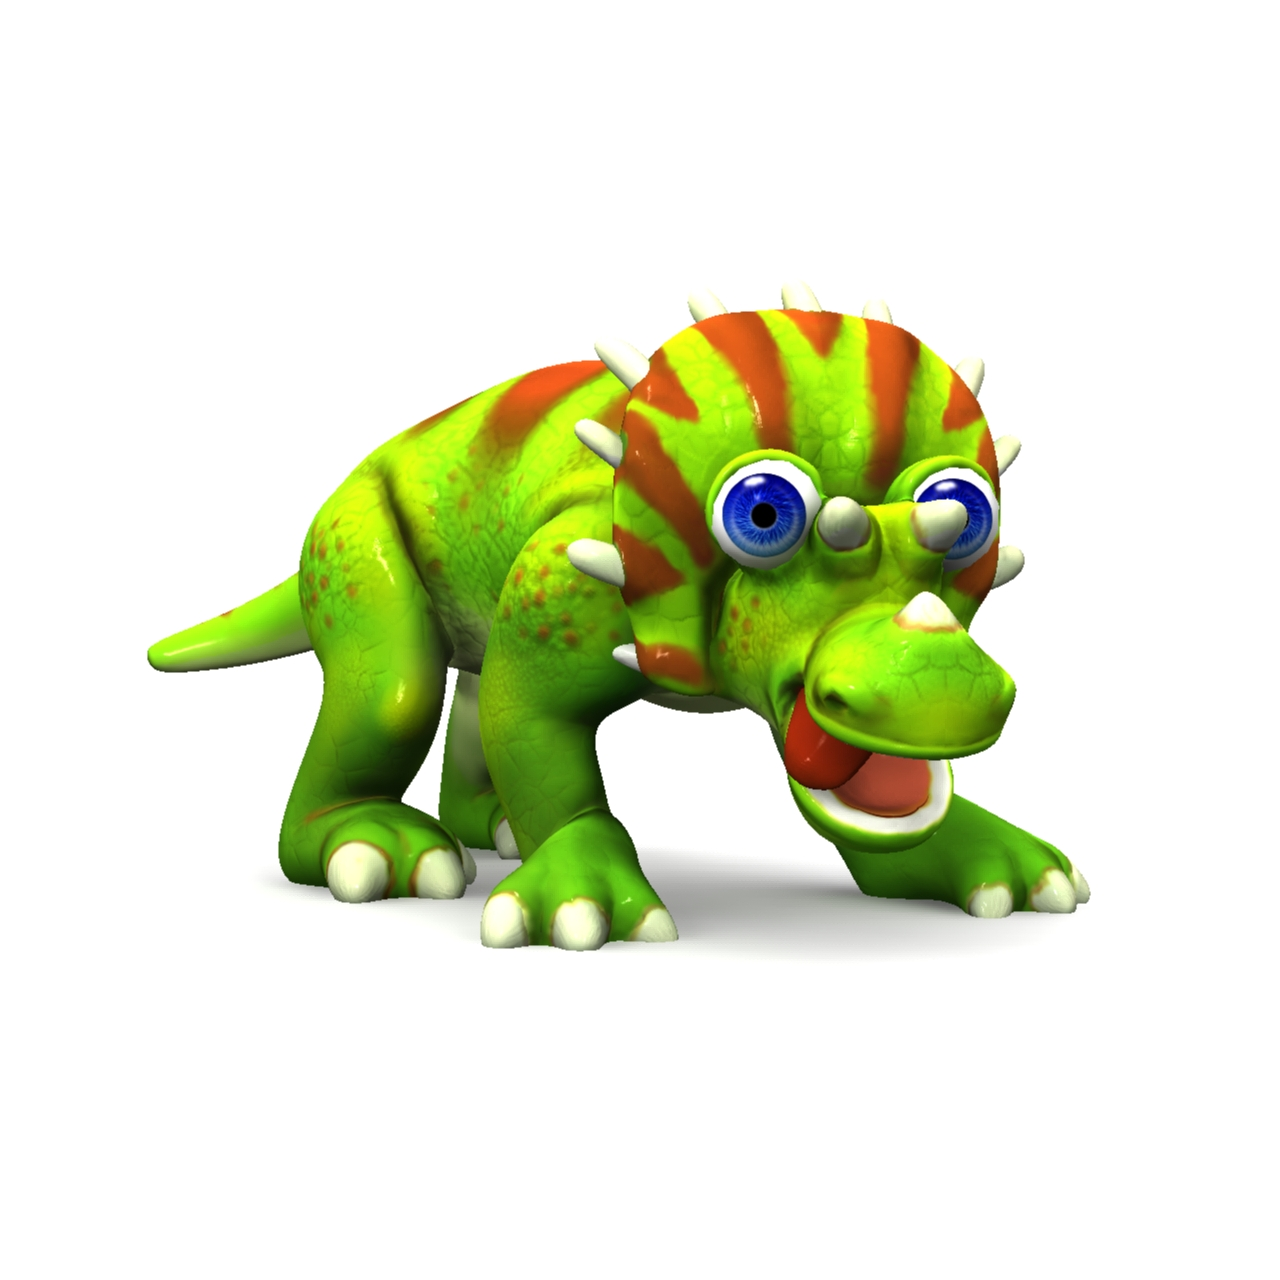 cizgi triceratops 3d model max fbx obj 212439